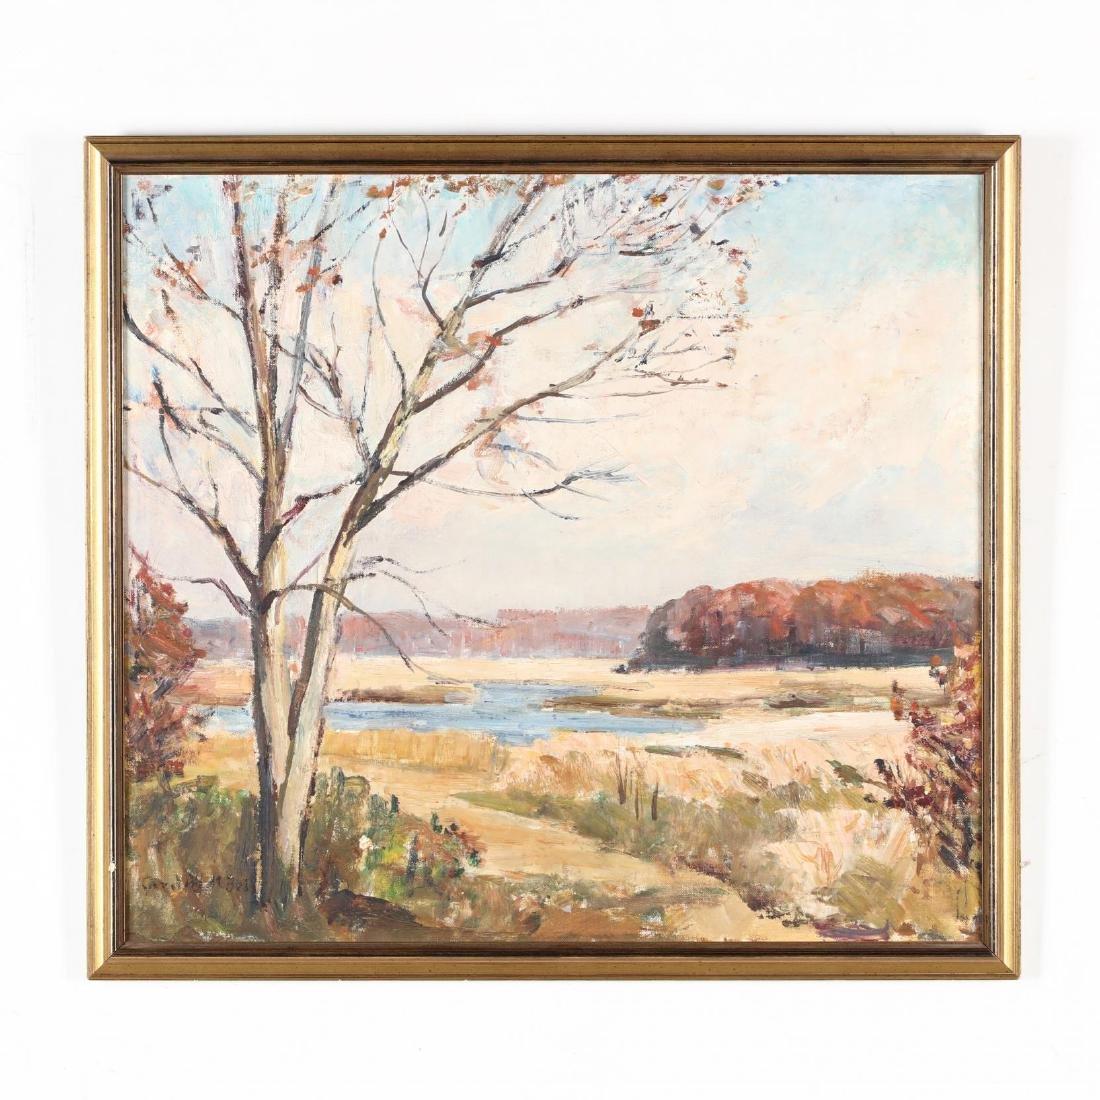 Caroline M. Bell (NY, 1874-1970), Autumn Landscape